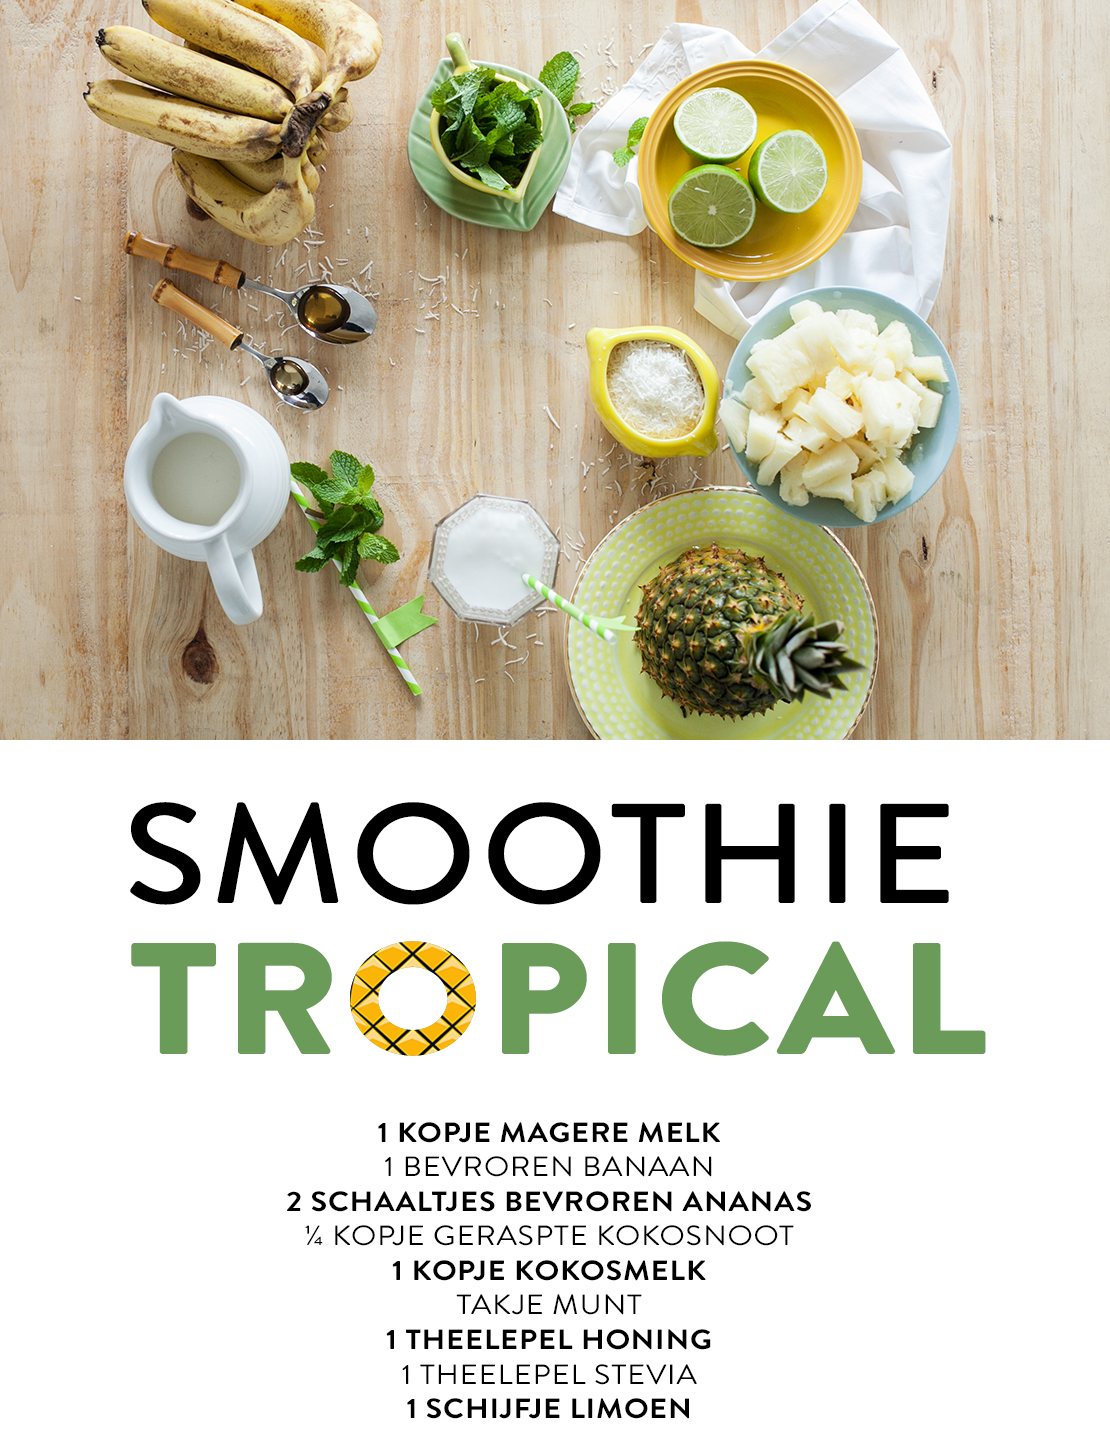 smoothie-recepten-tropical